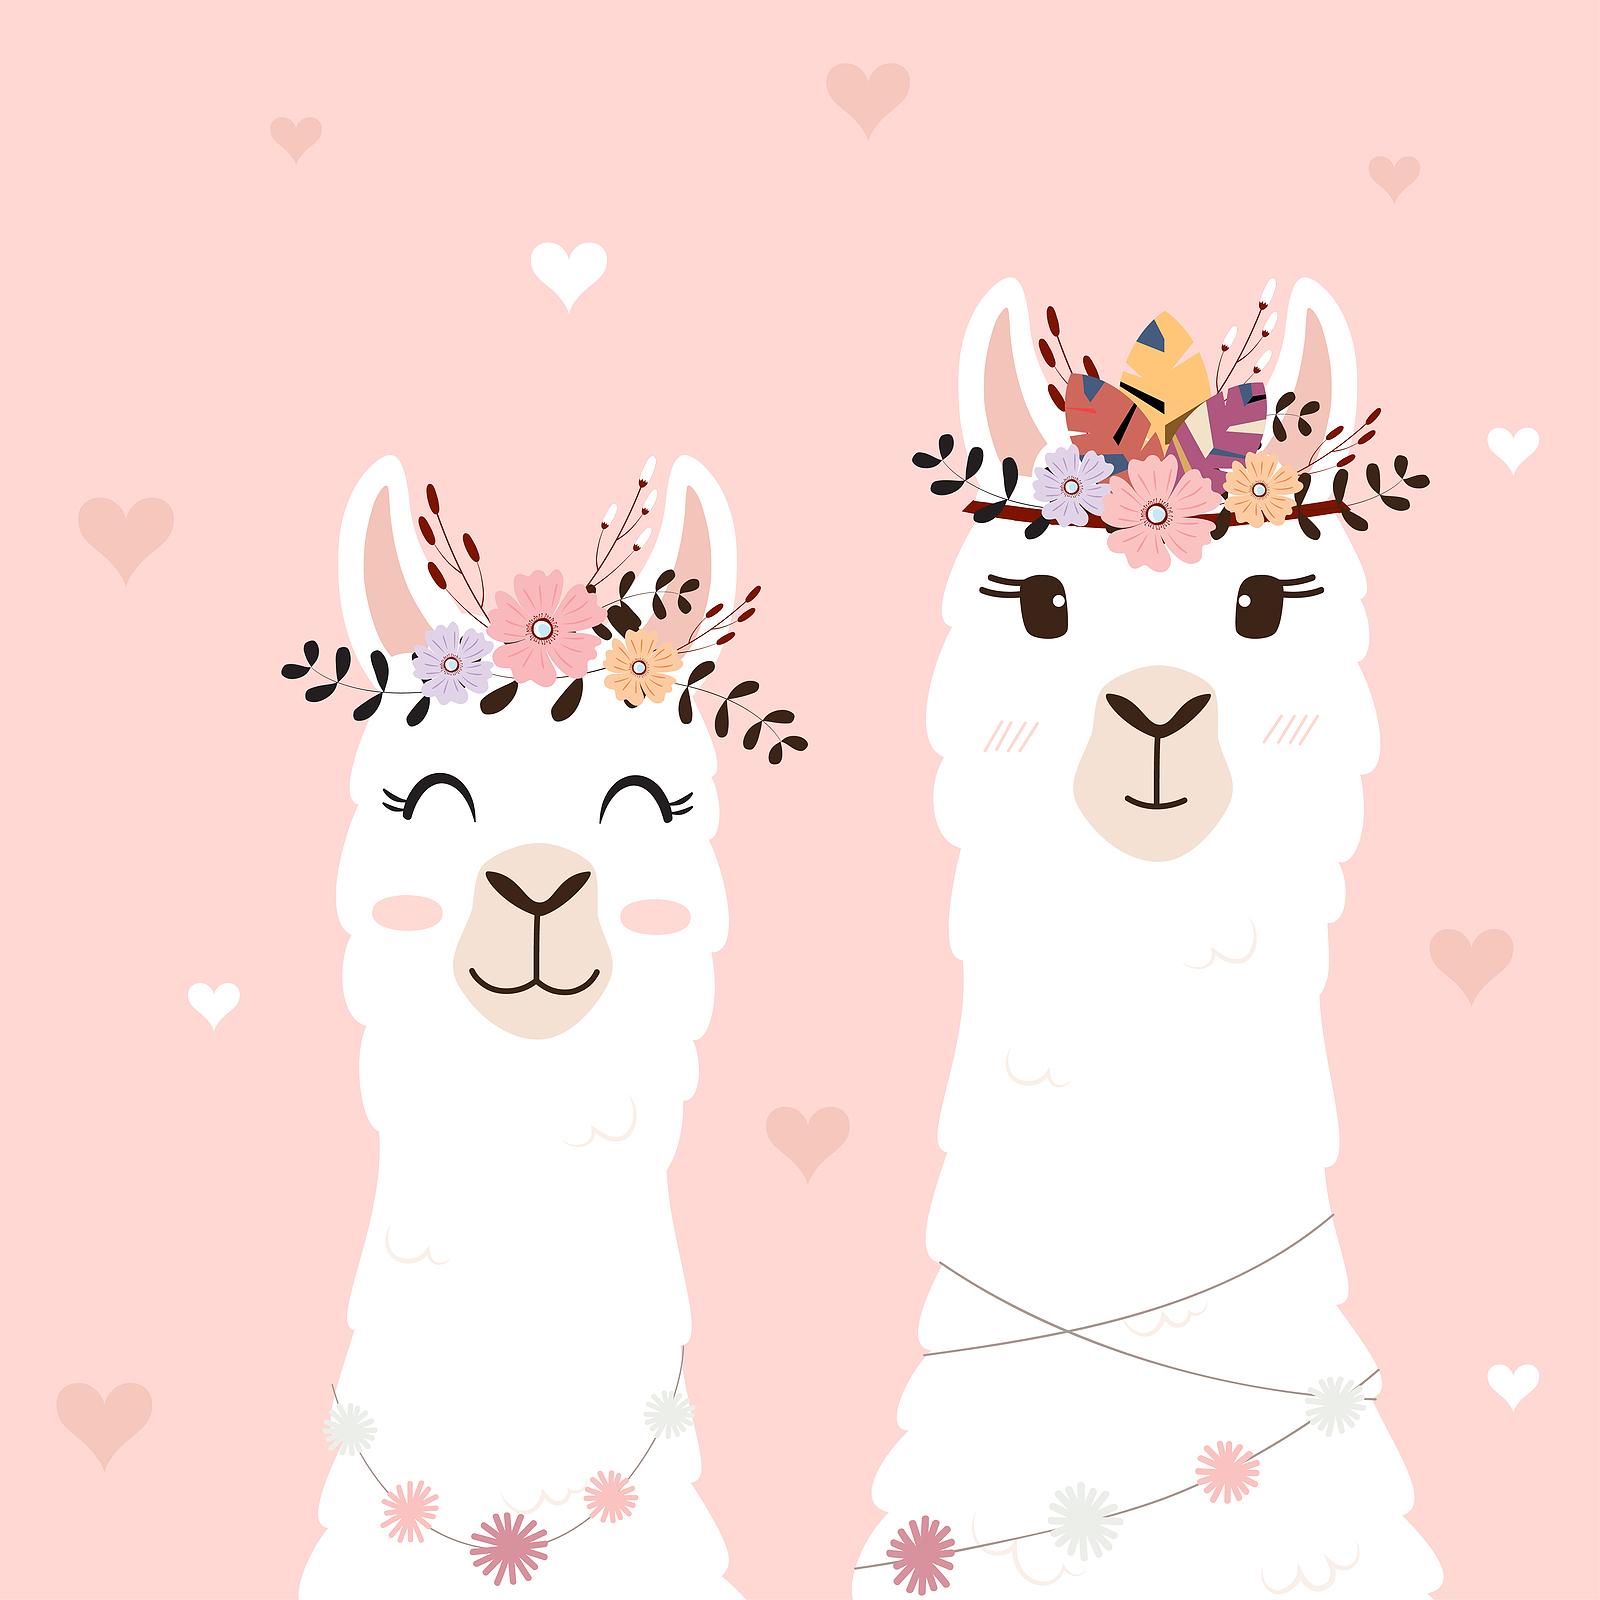 Cartoon Drawing of Two Alpacas Dressed for Wedding